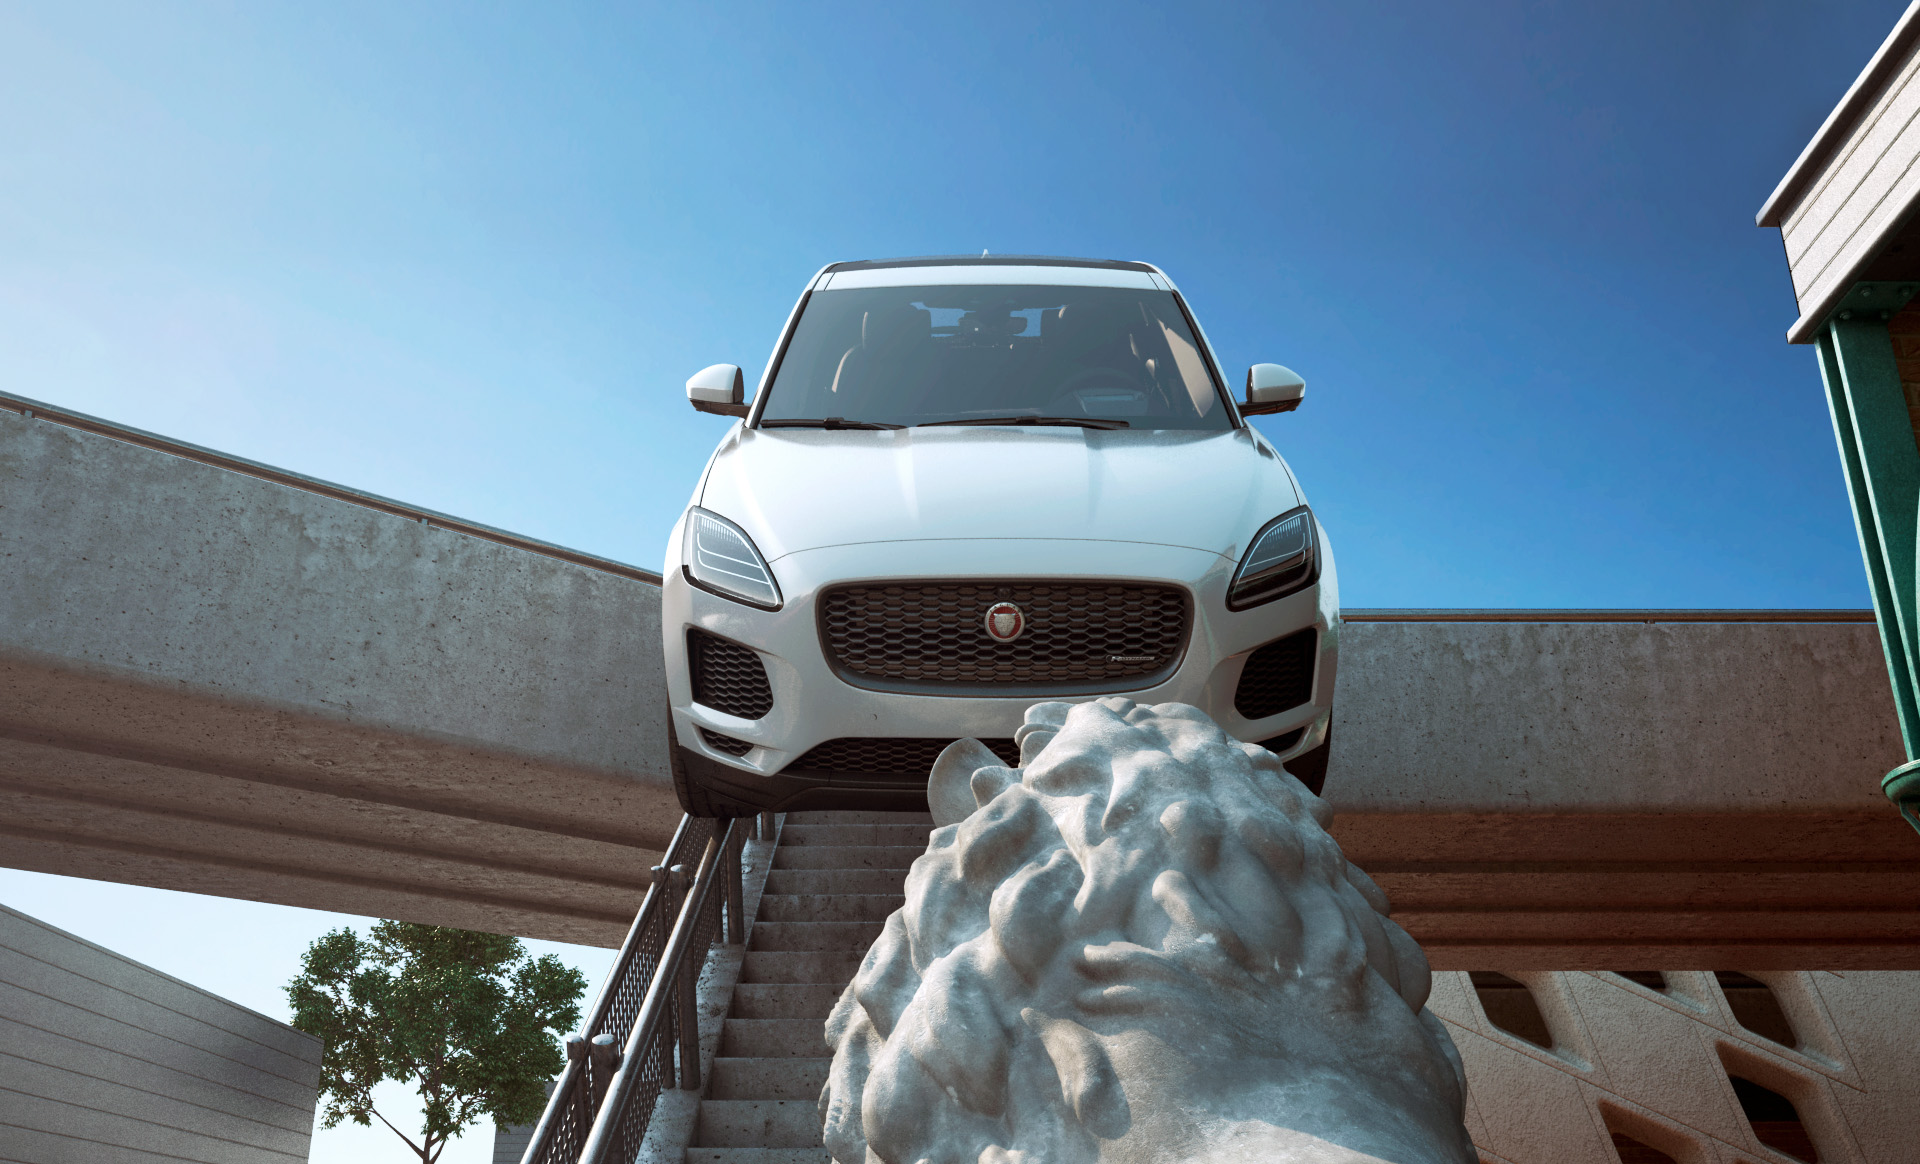 Jaguar_e-pace_image7.jpg